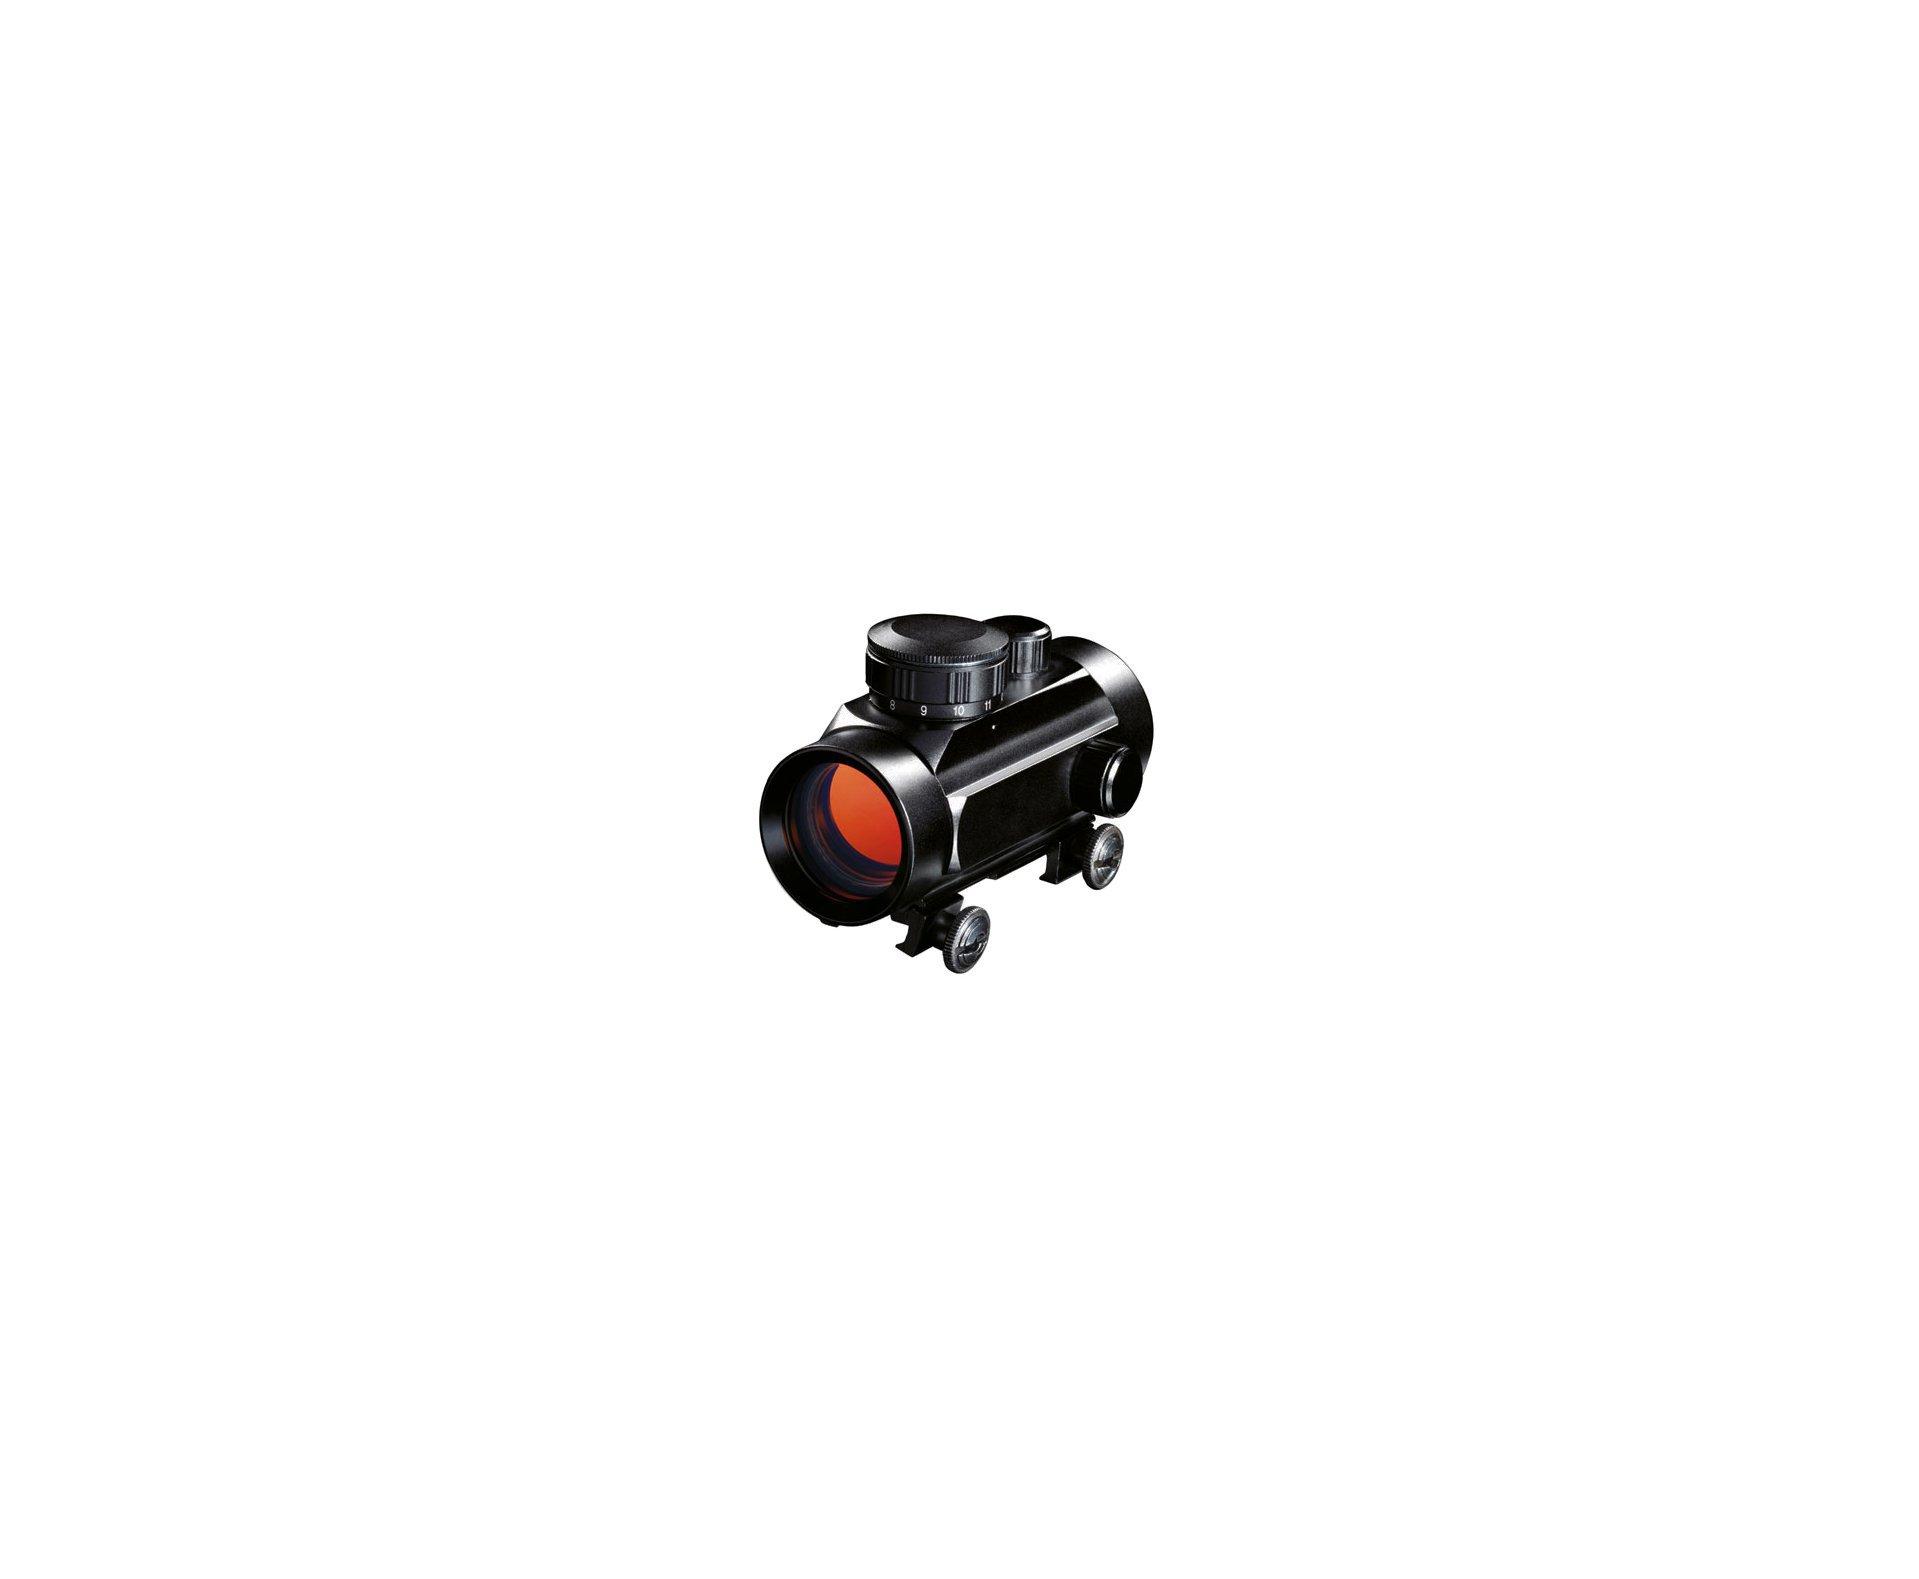 "Carabina De Pressão Cbc B19-x 5,5mm + Red Dot 1x30 + Capa 45"""